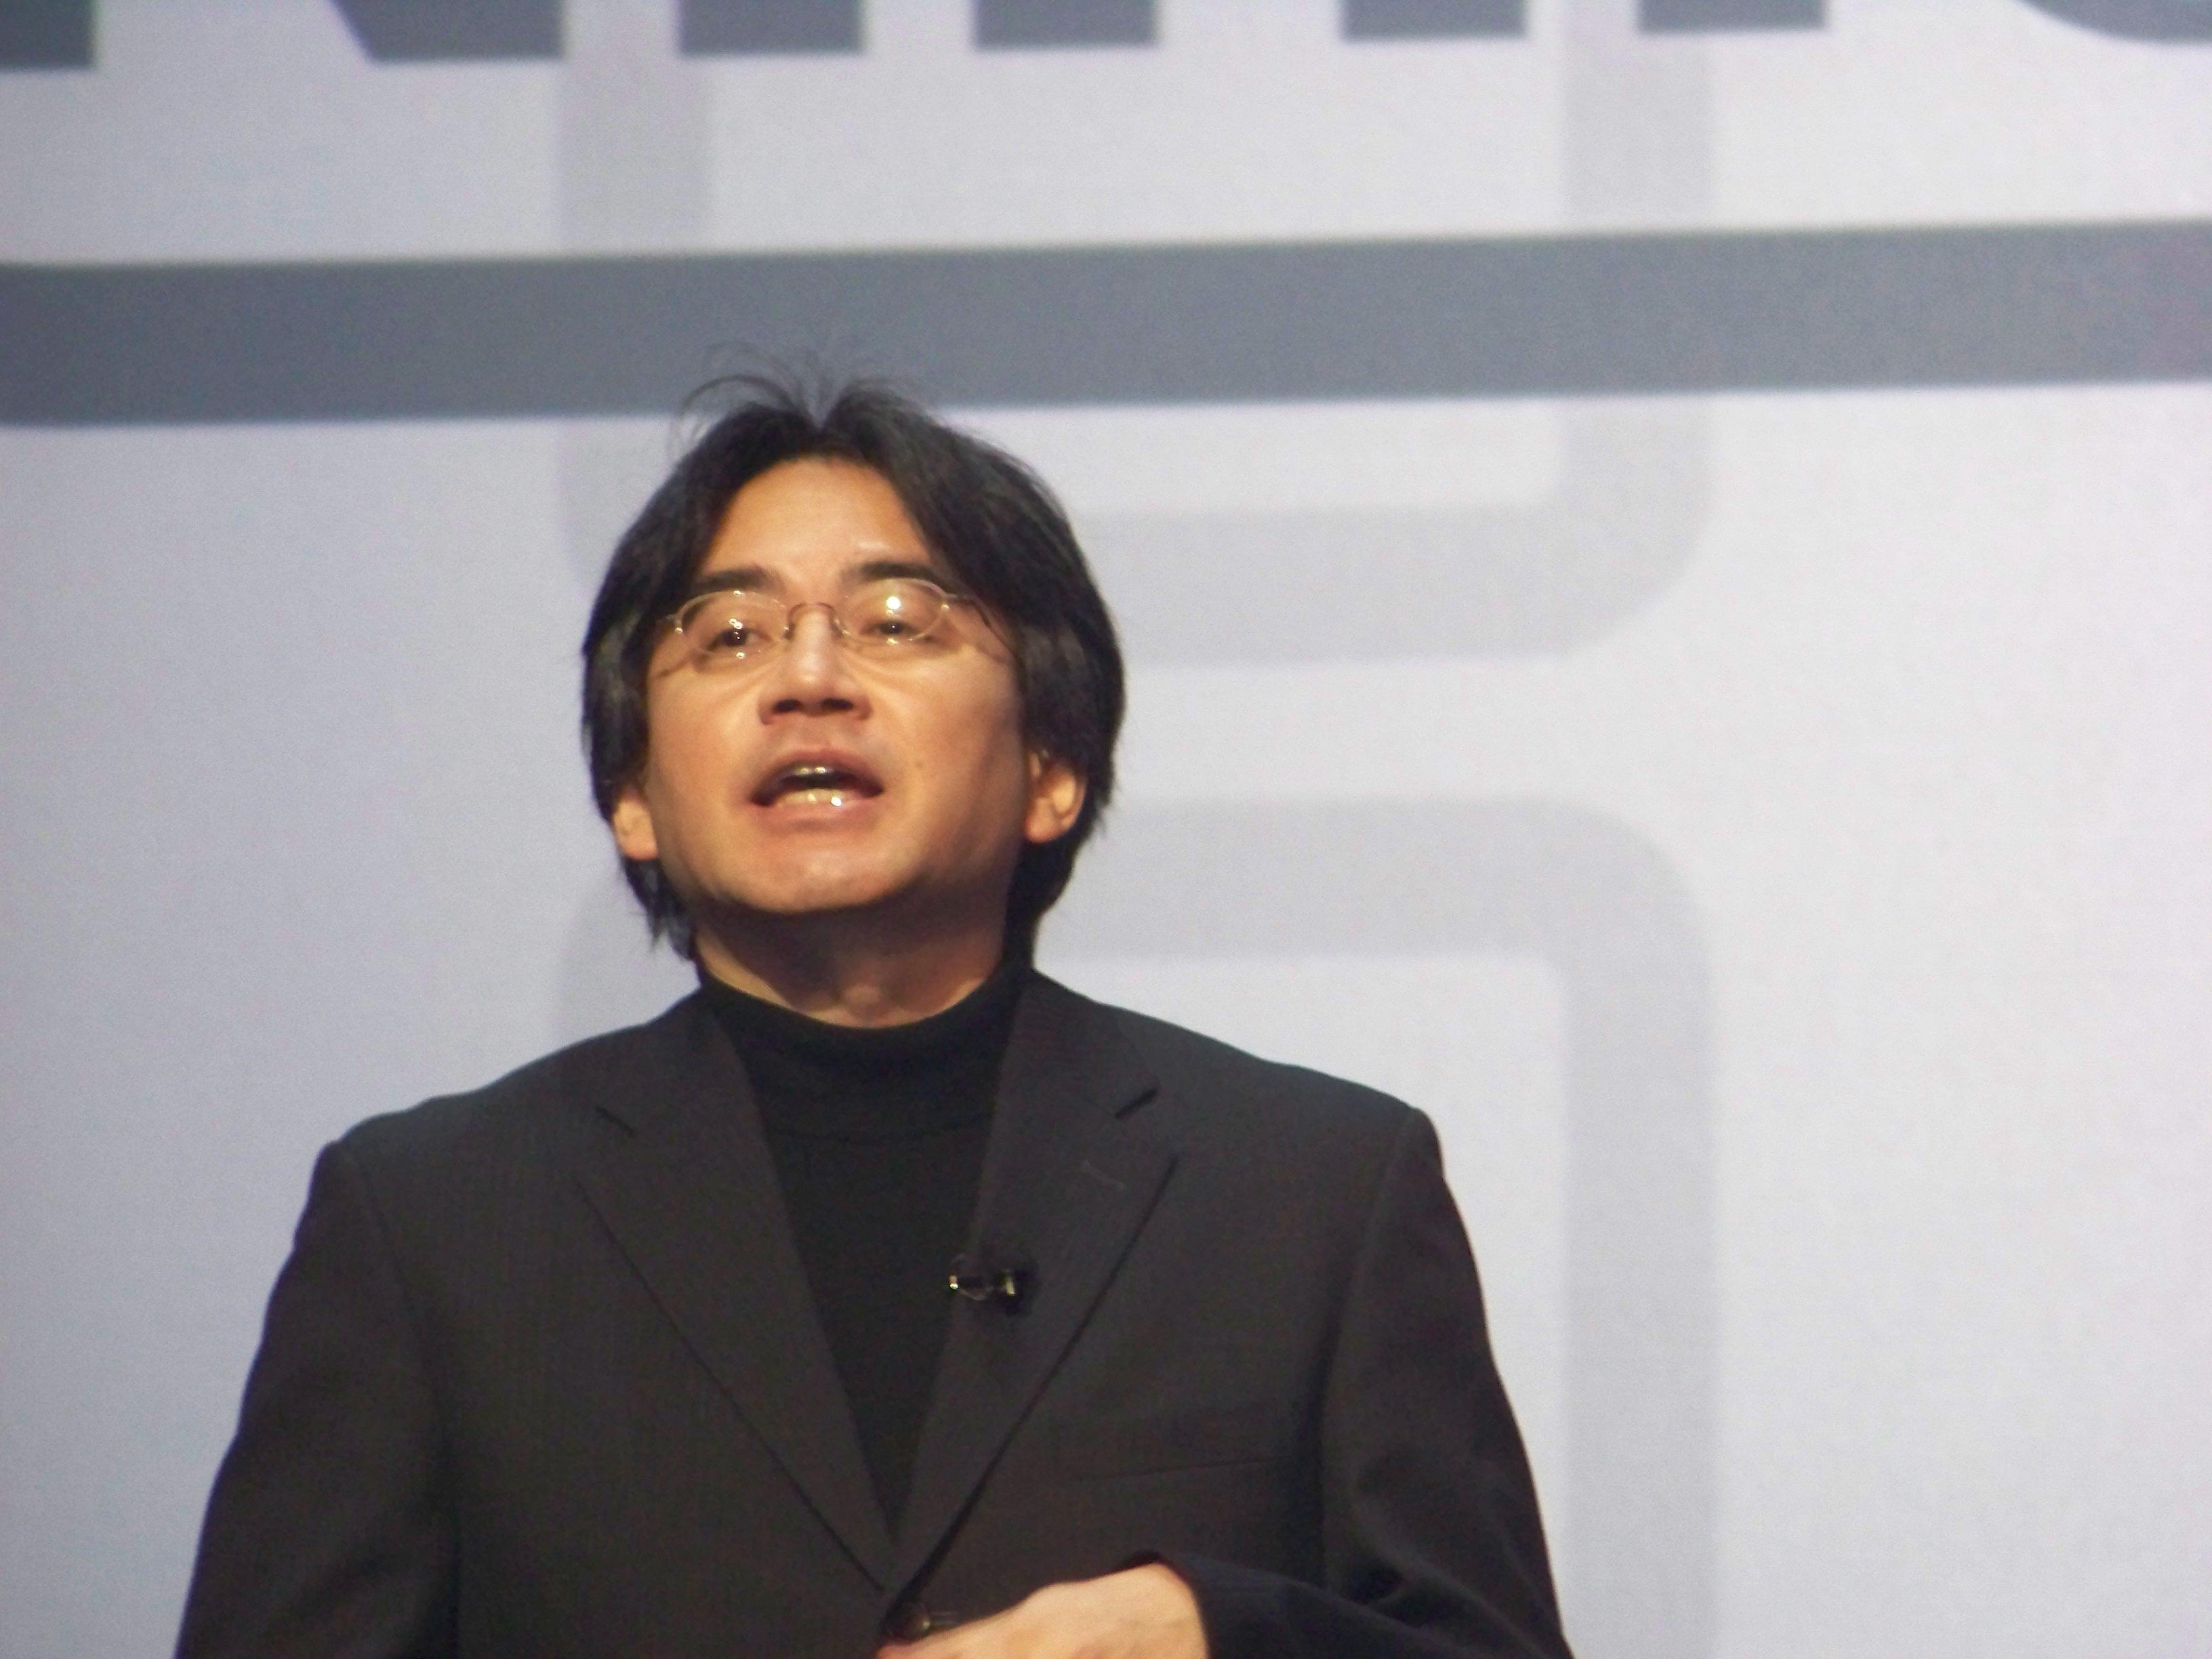 Satoru Iwata of Nintendo. Is the Big N's big cheese in trouble?